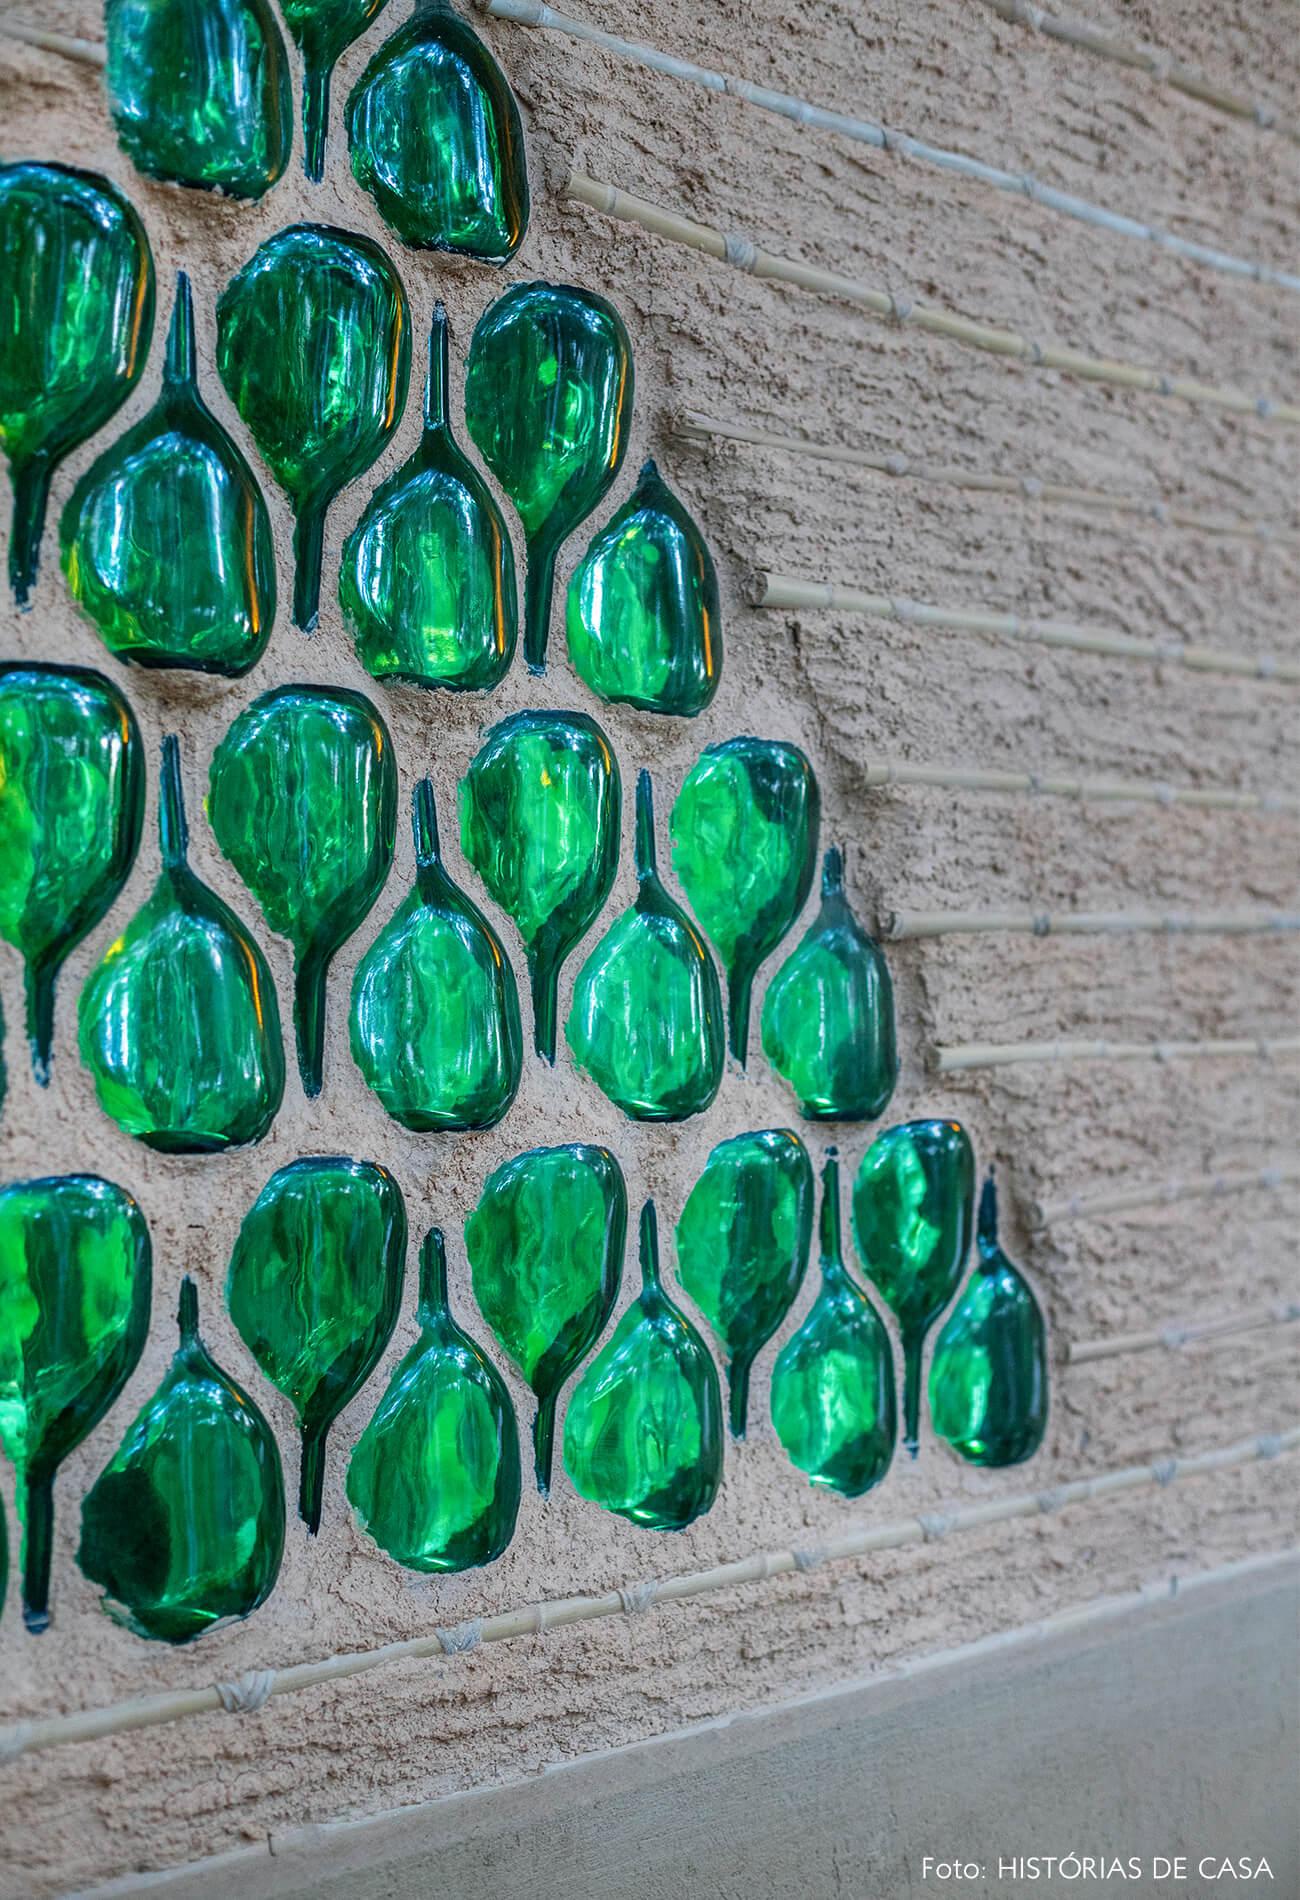 trancoso-vilasete-hotel-decoracao-79-detalhe-garrafas-verdes-parede